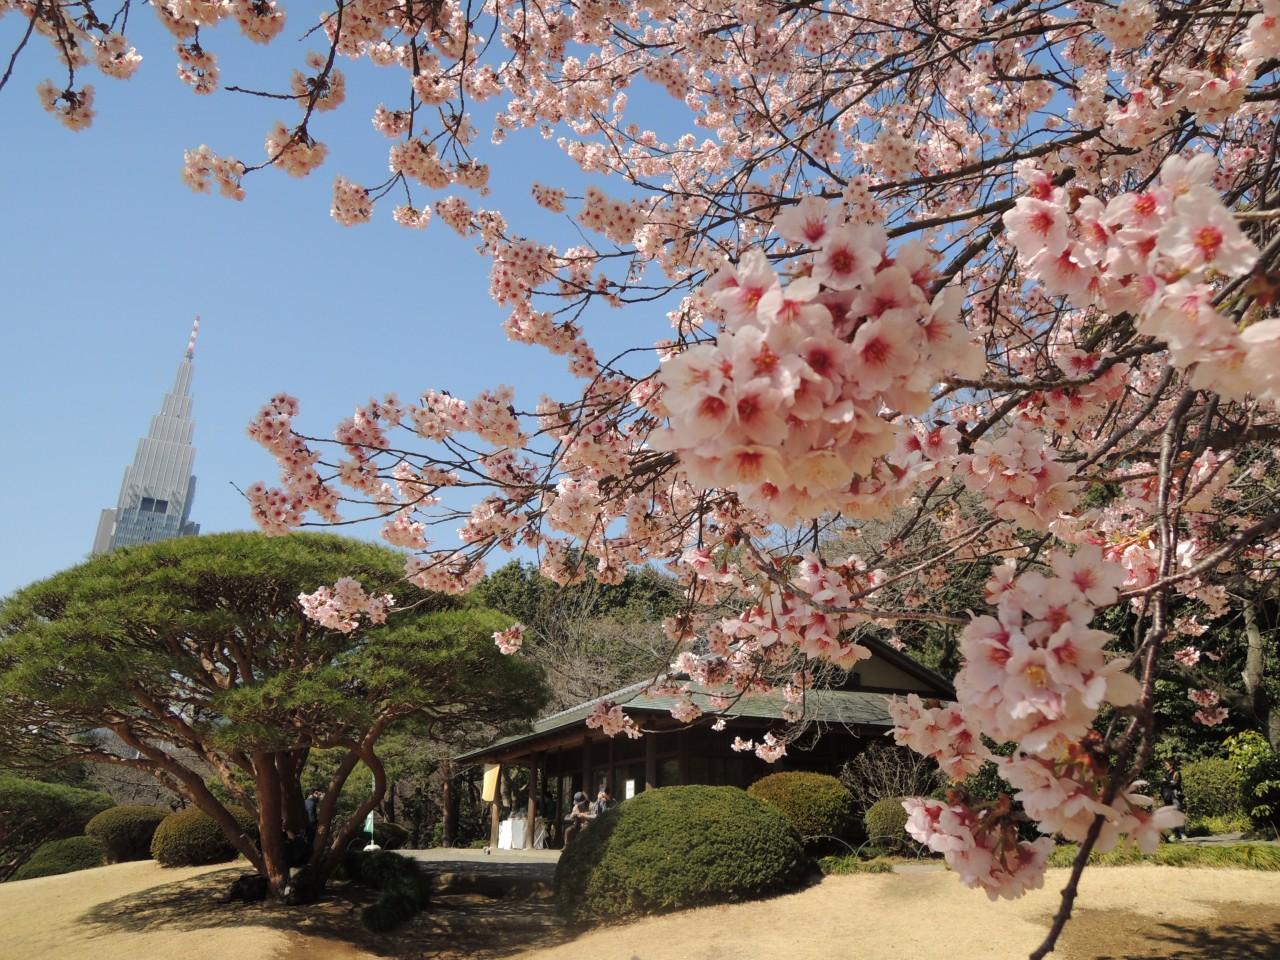 [By Bus] 1Day. Nara Cherry Blossom. Lunch *ALInoBABY